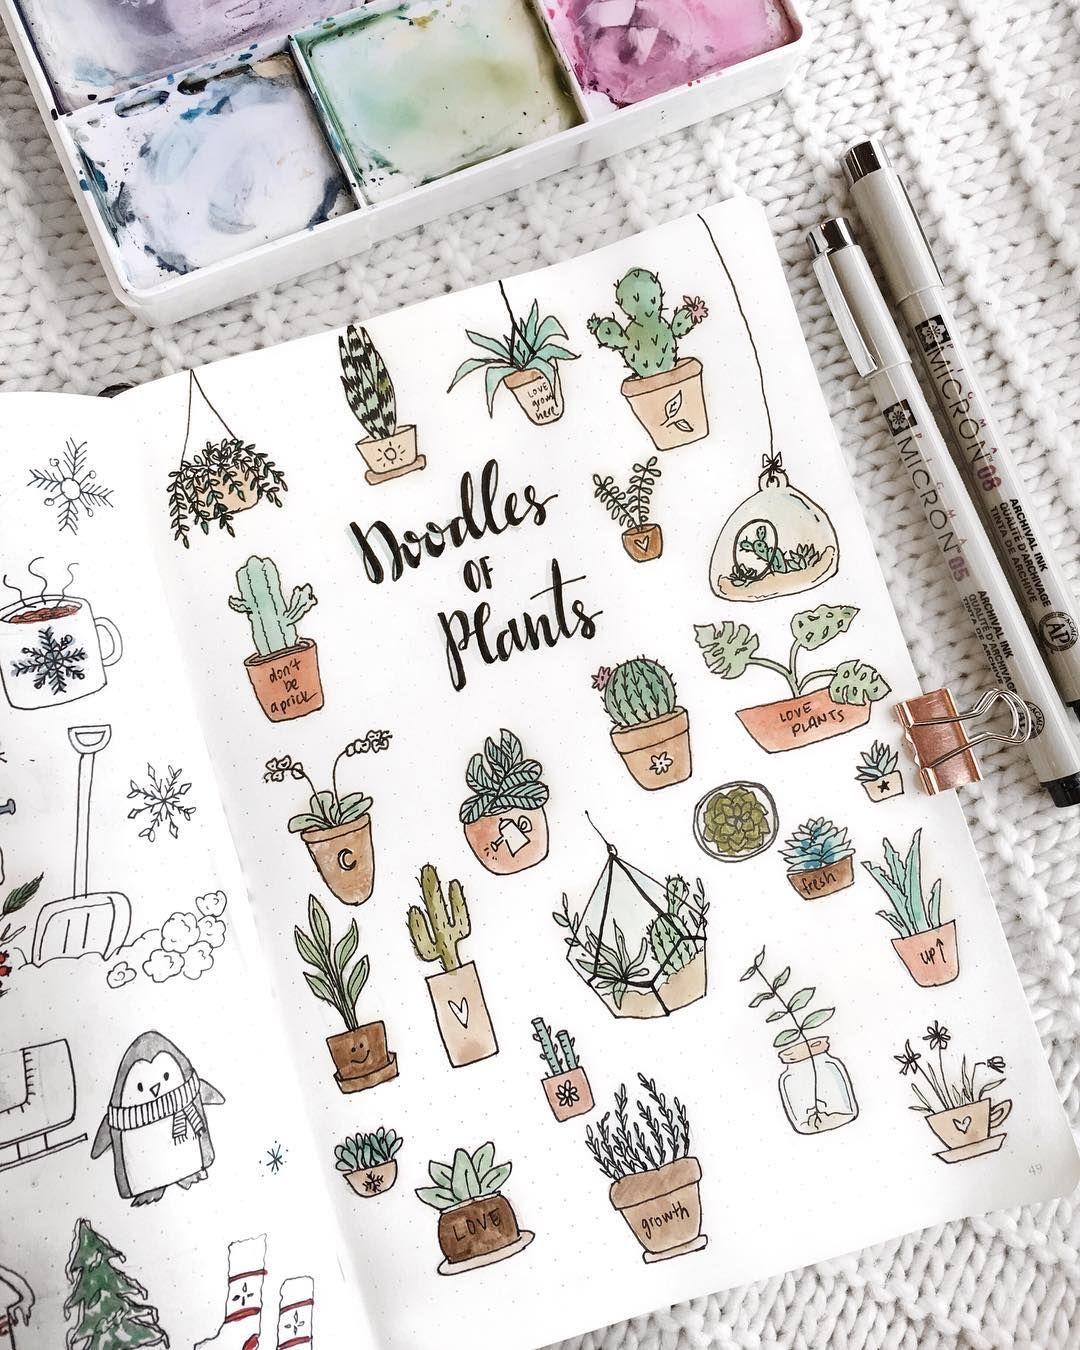 Bullet journal potted plants doodles, bullet journal drawing ideas